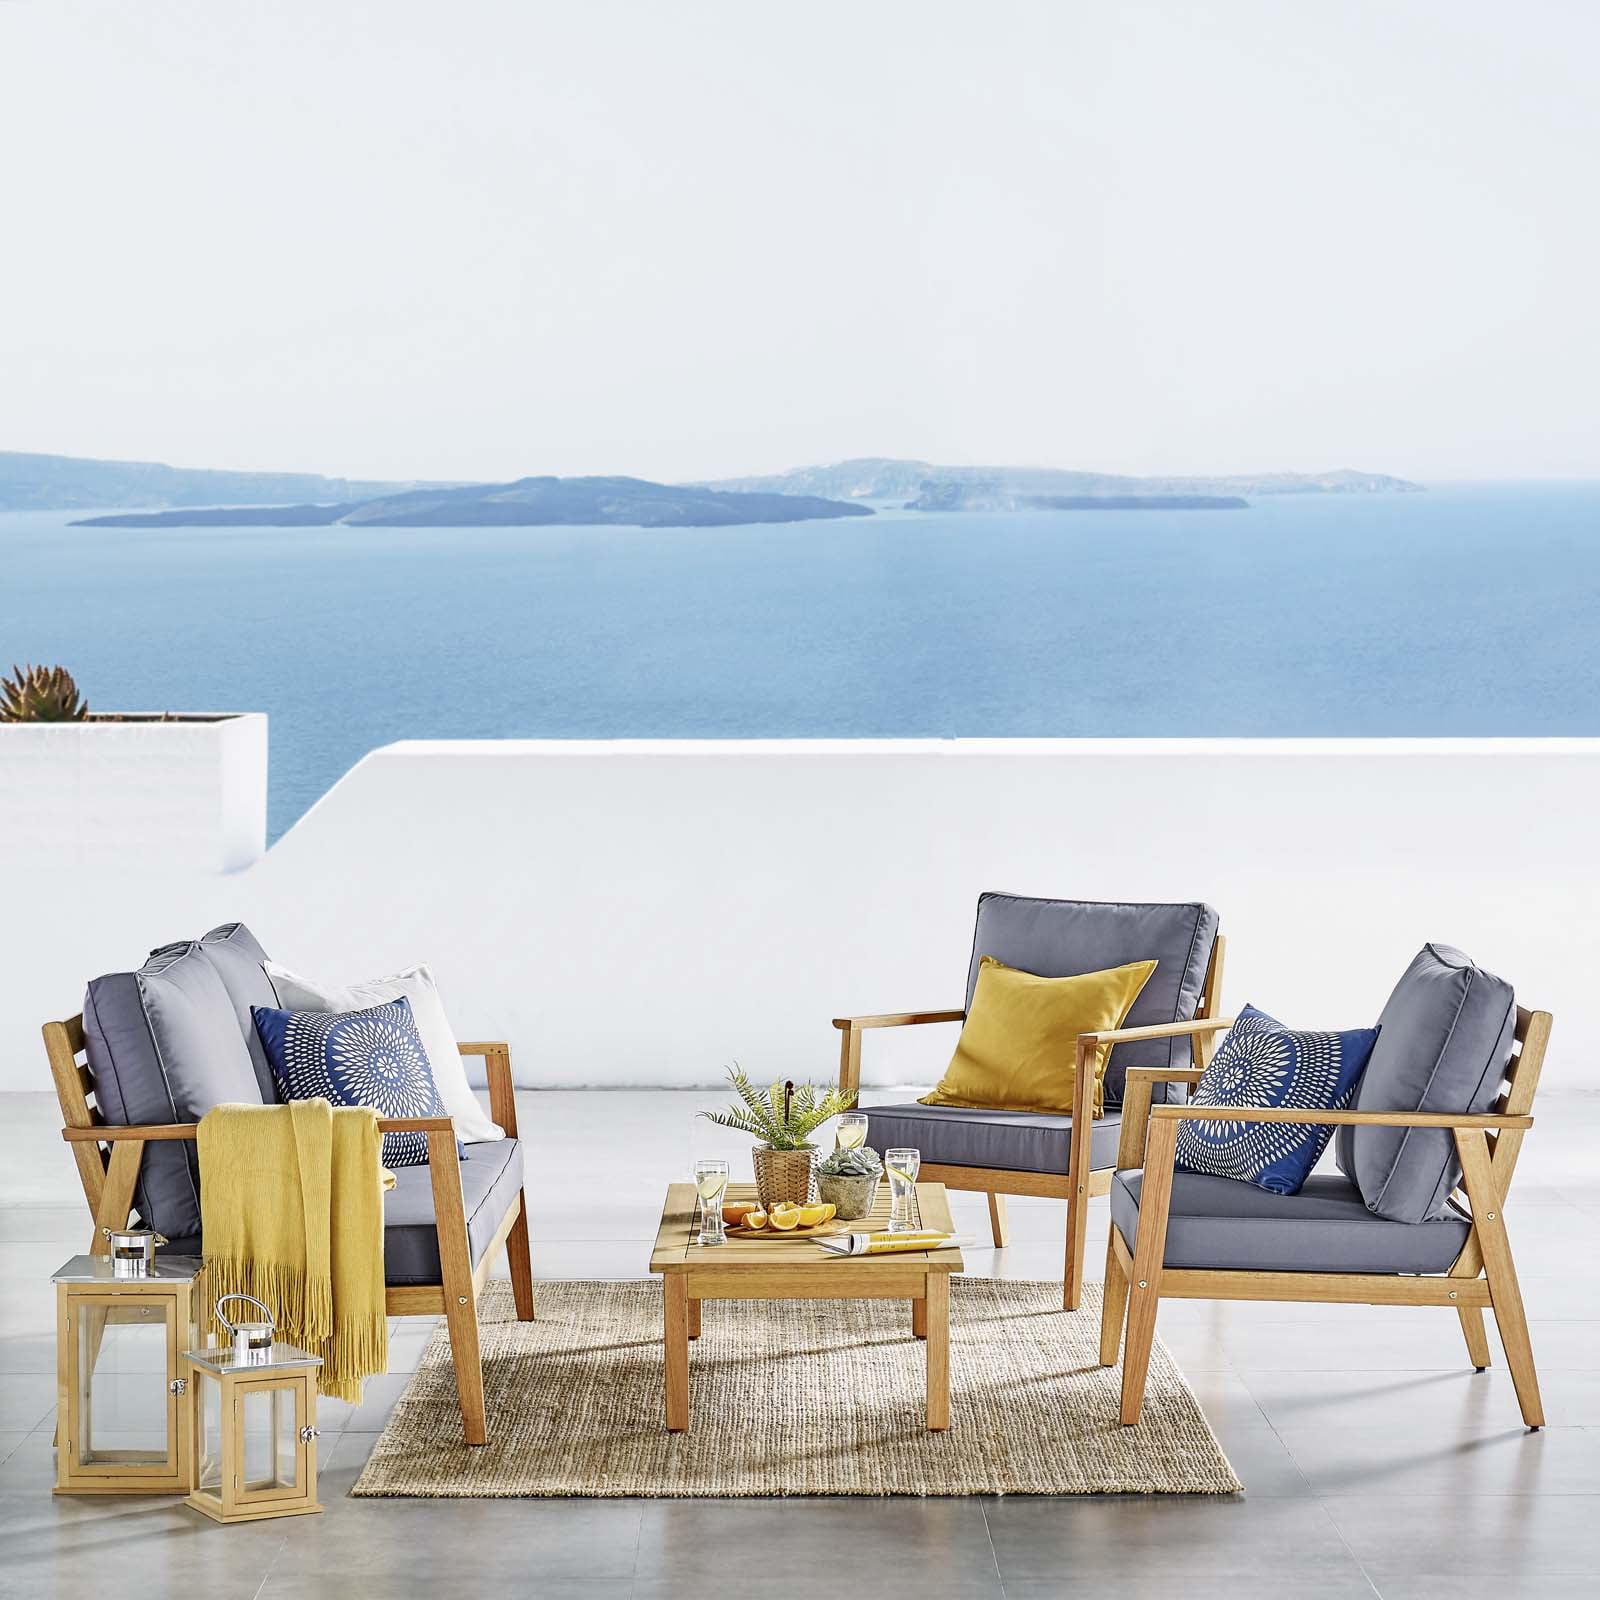 syracuse eucalyptus wood outdoor patio 4 piece furniture set in natural gray